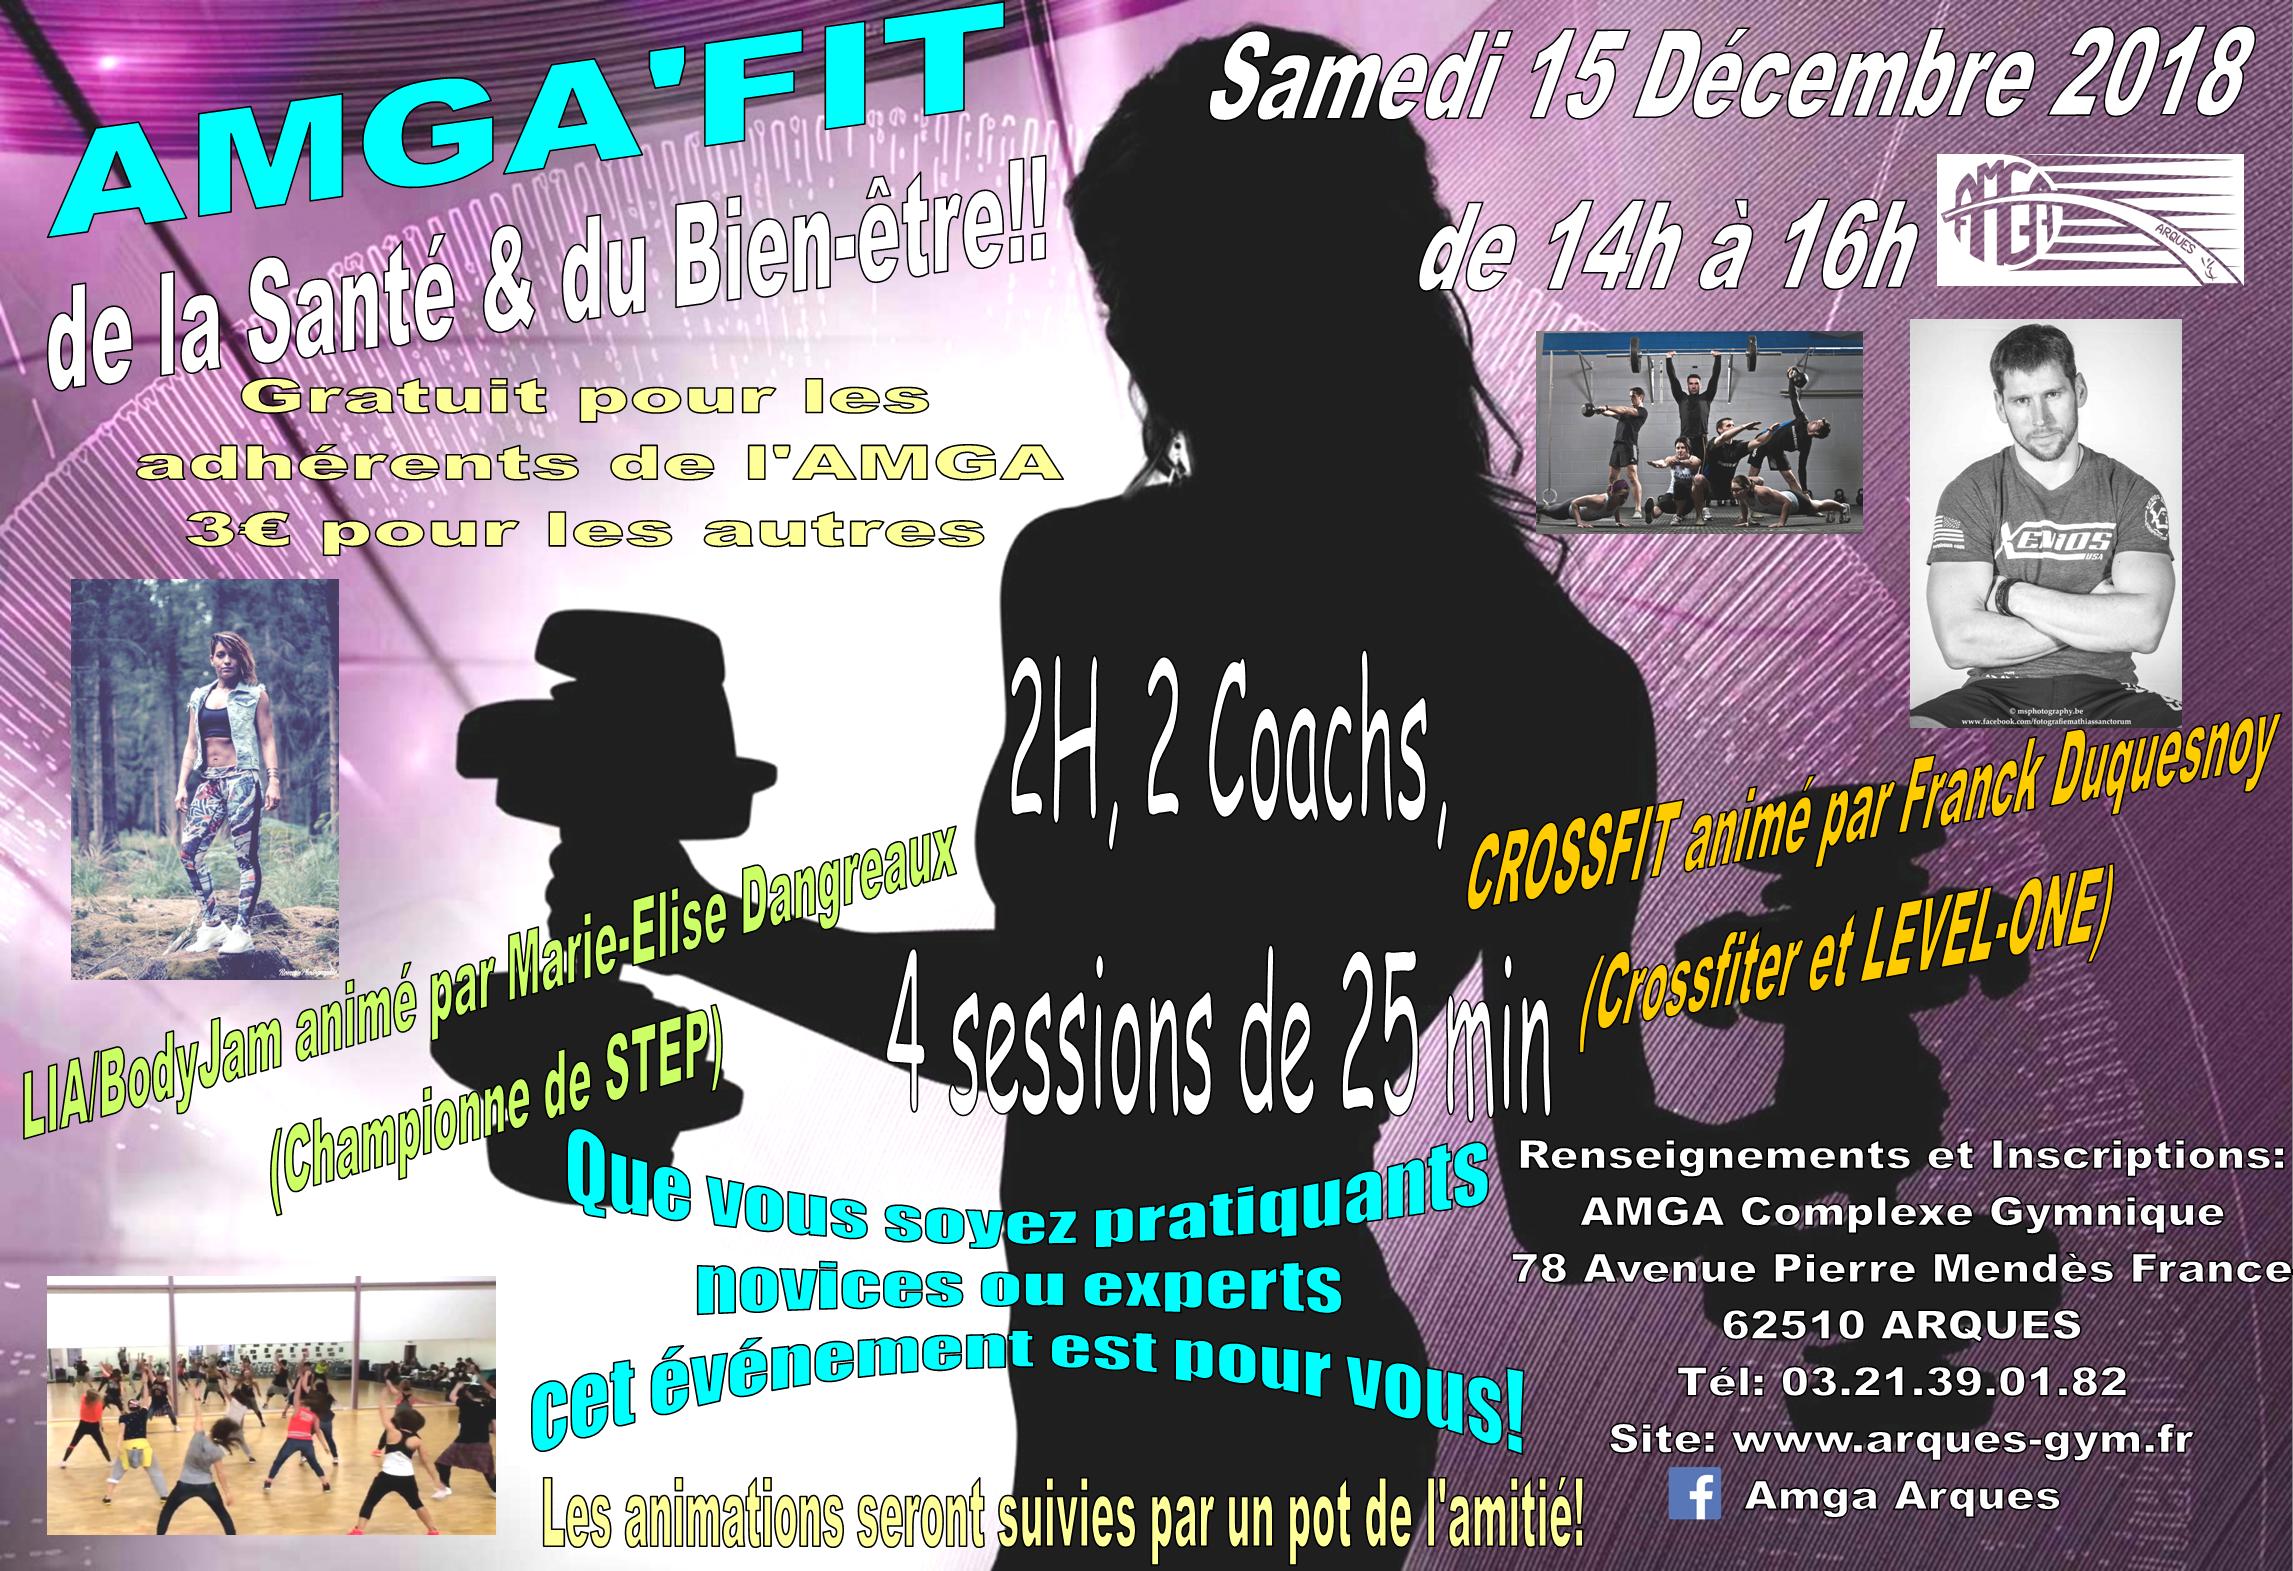 AMGA'FIT le samedi 15 décembre